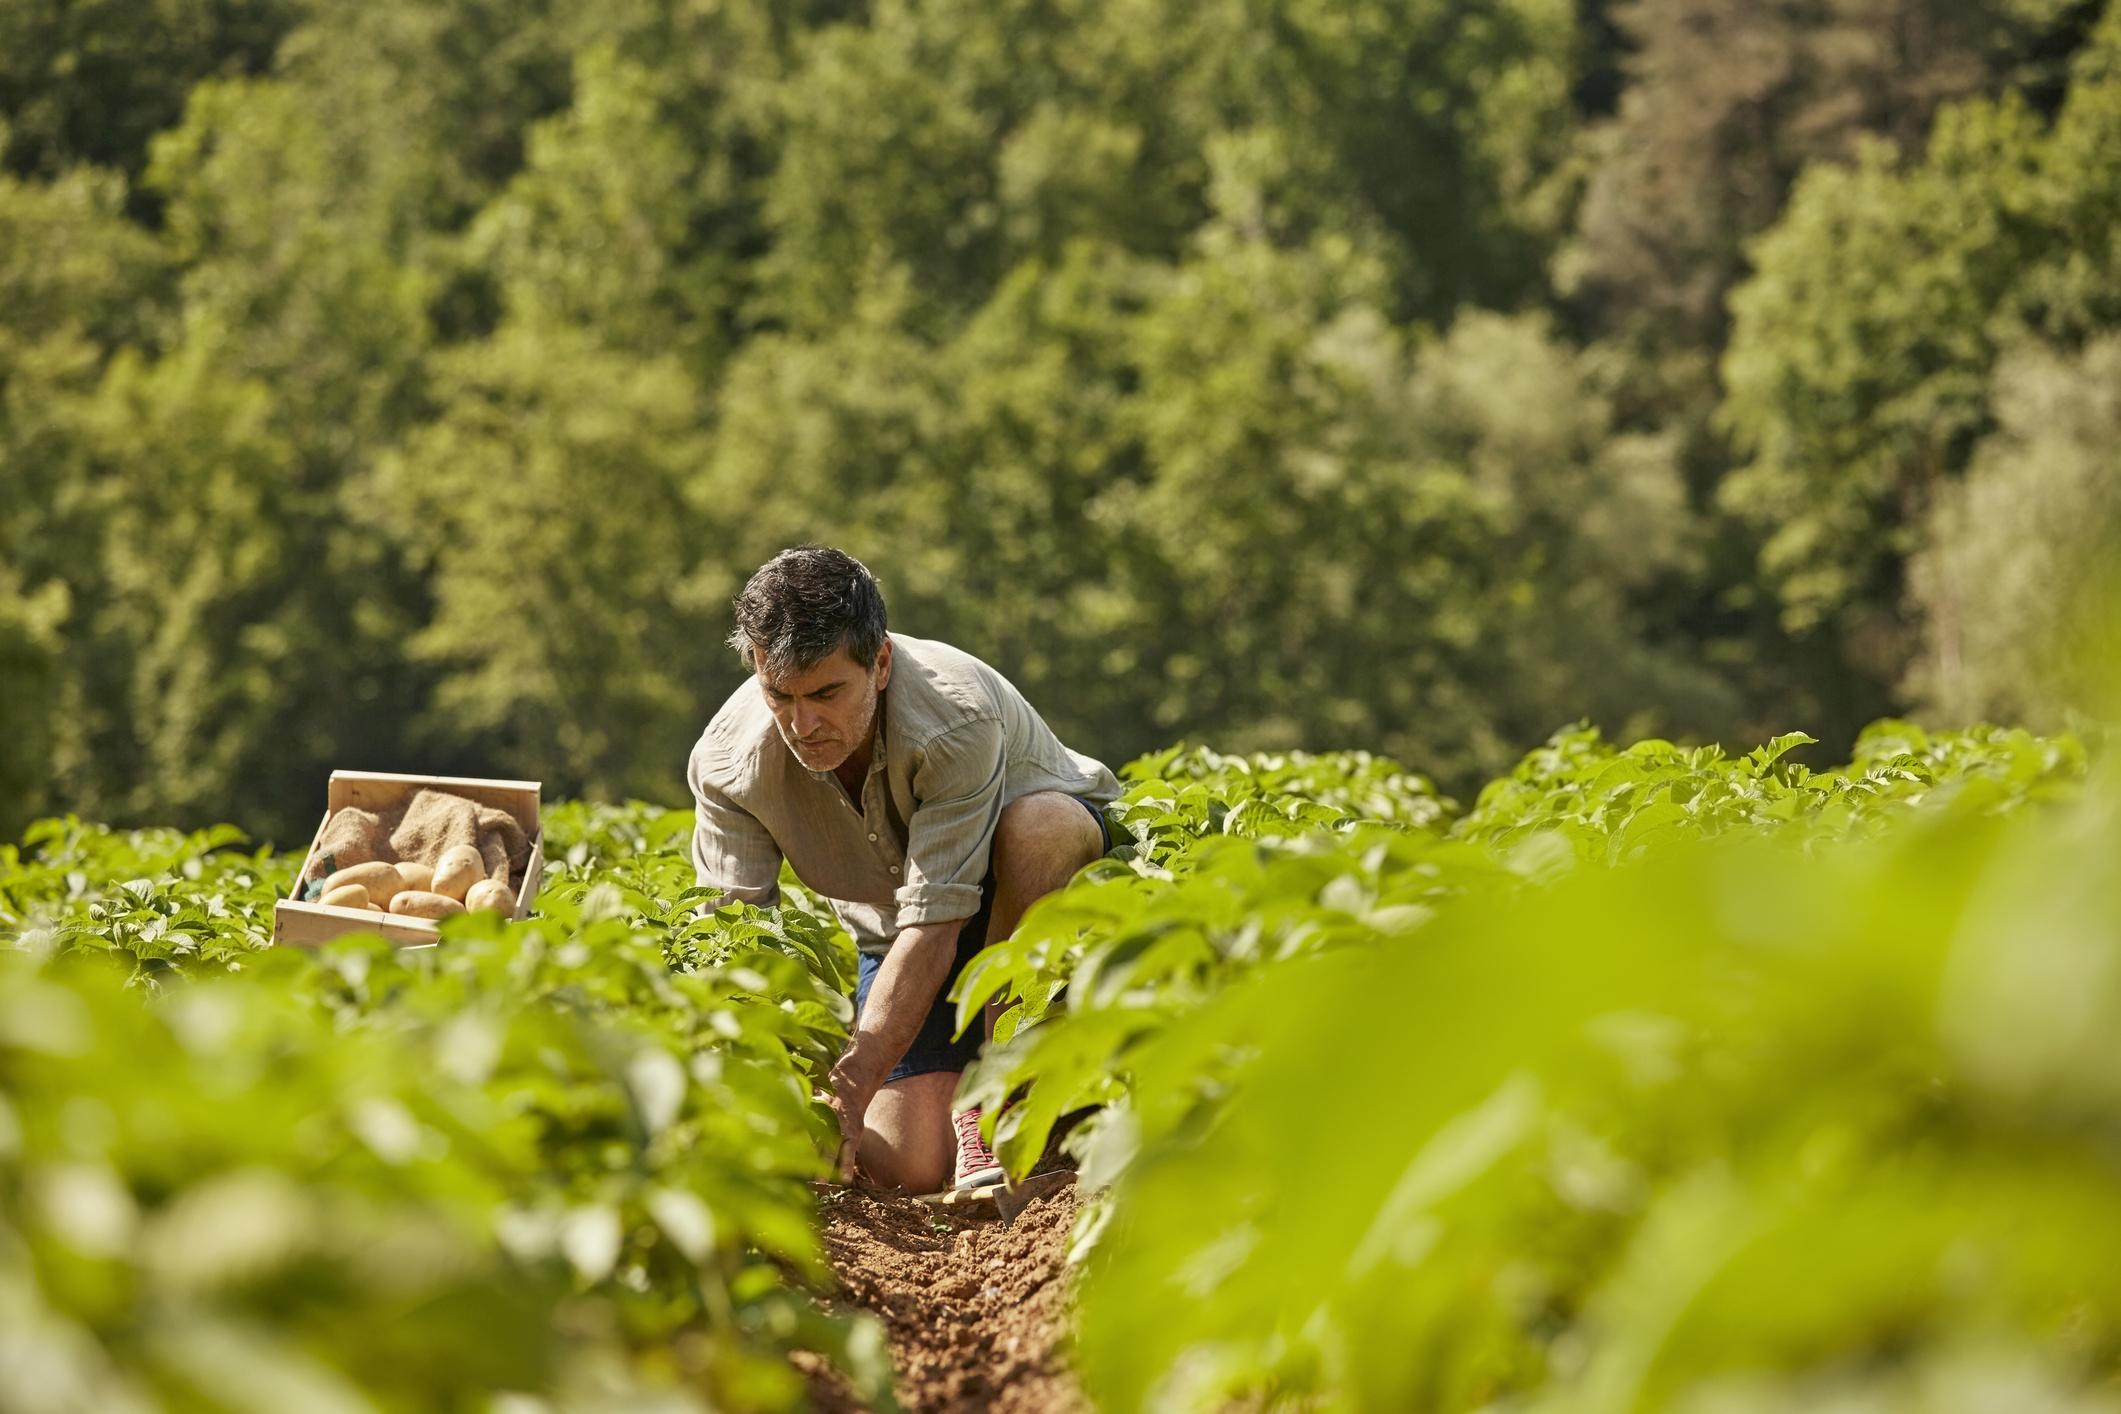 Mature man harvesting potatoes on field